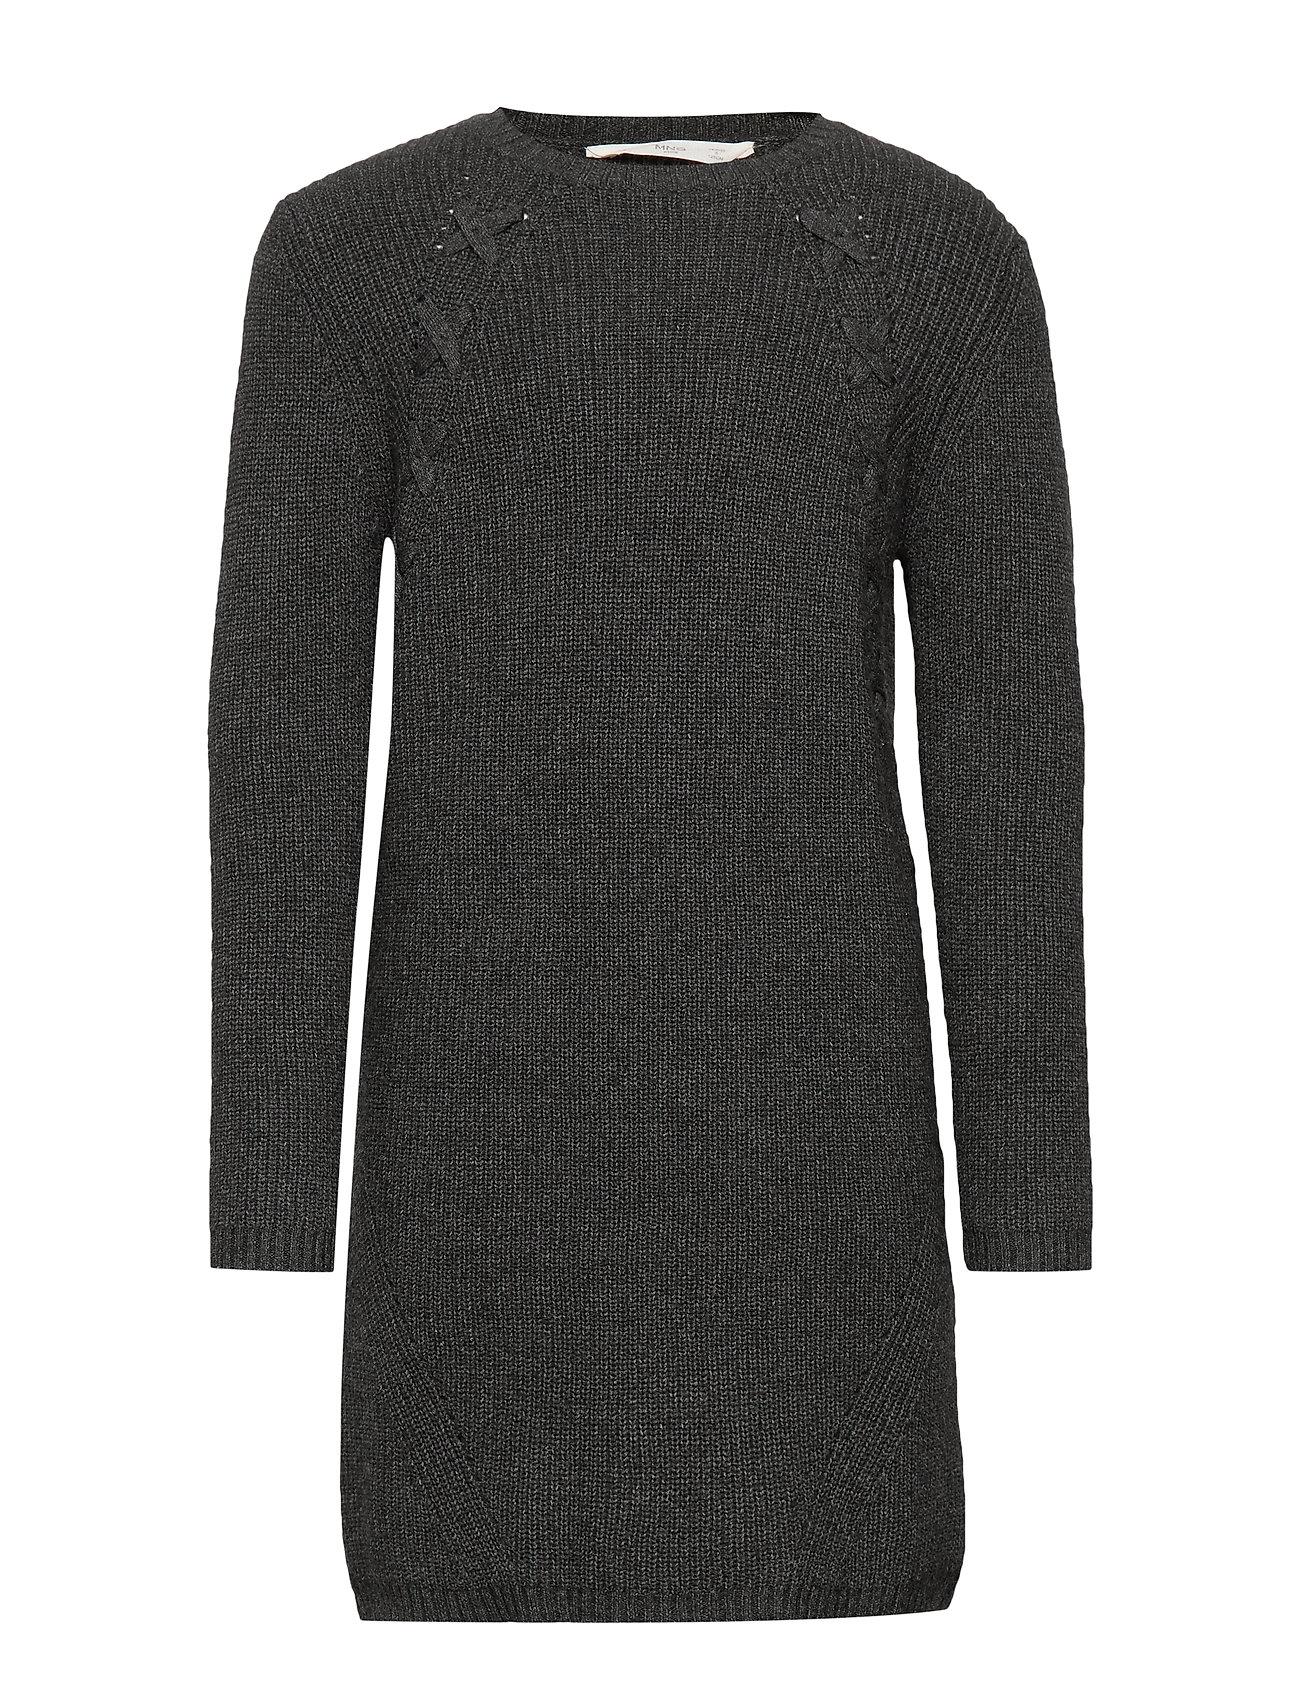 White knitdress from Mango   Strik kjole   Long knitted